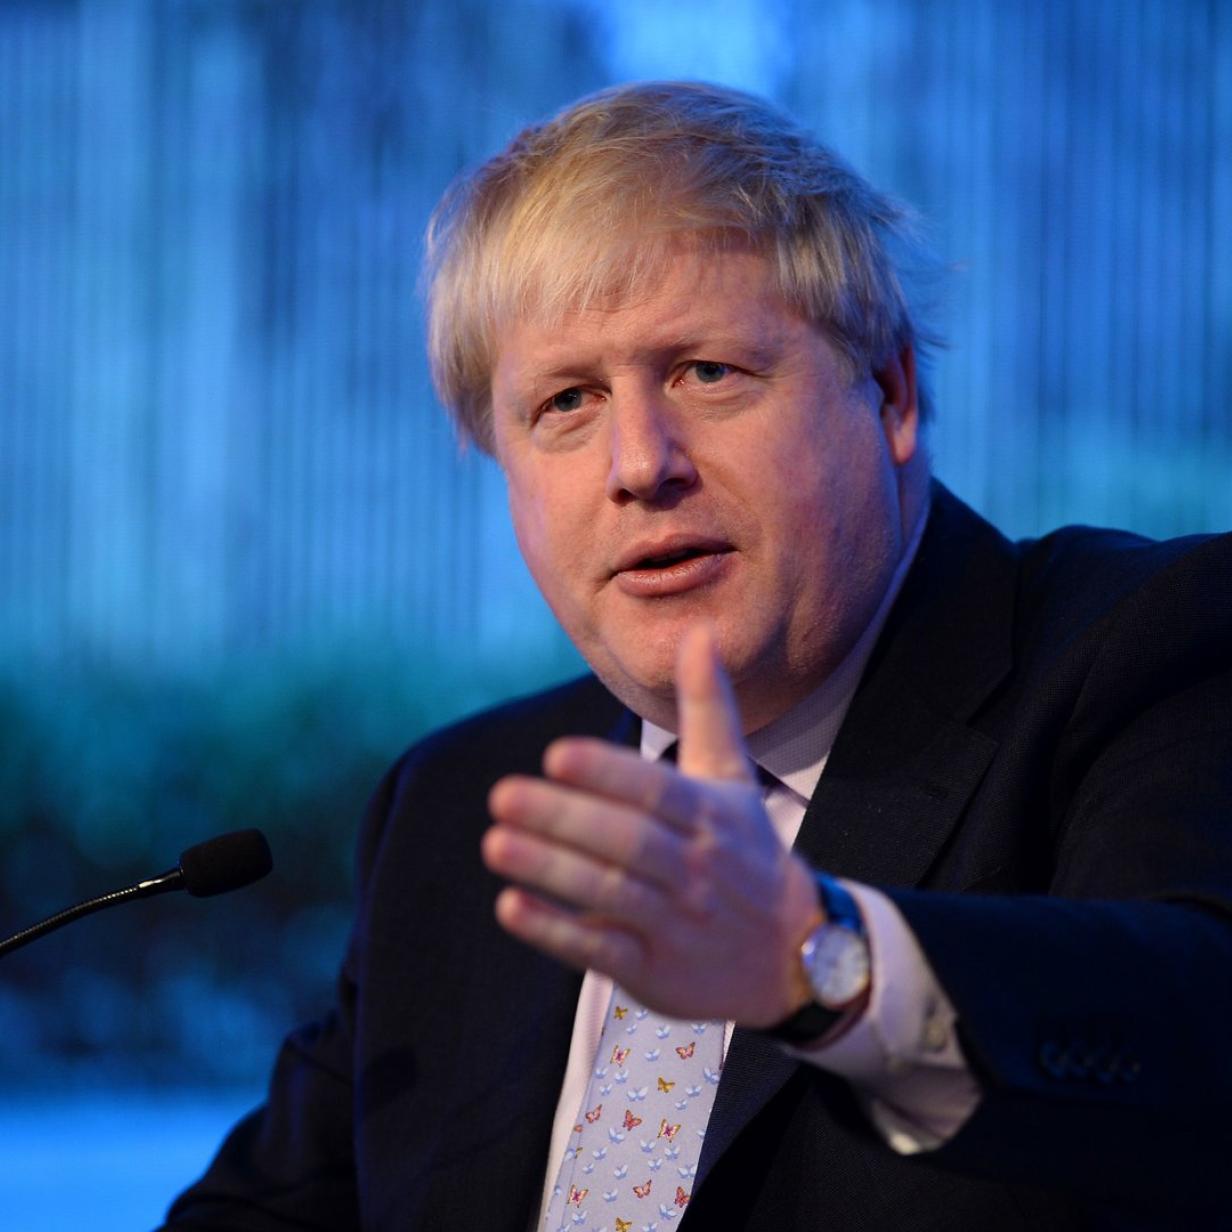 Boris Johnson droht Prozess wegen Lügen während Brexit-Kampagne